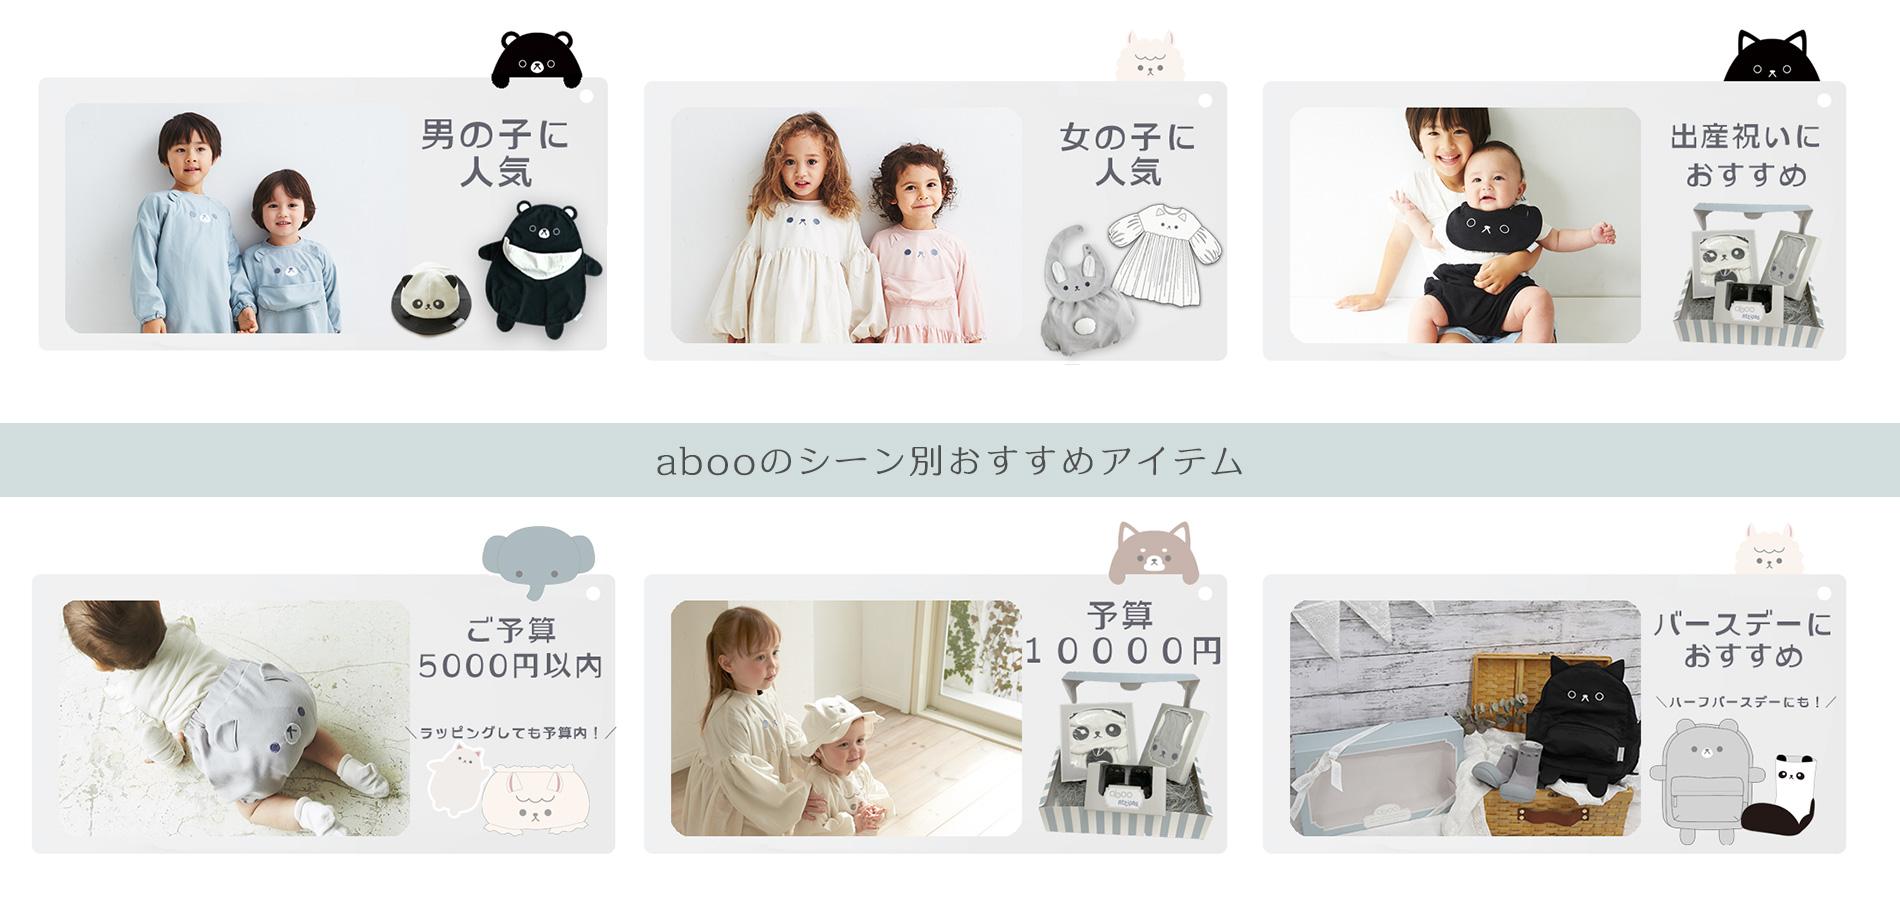 aboo shop 代官山店グランドオープン!